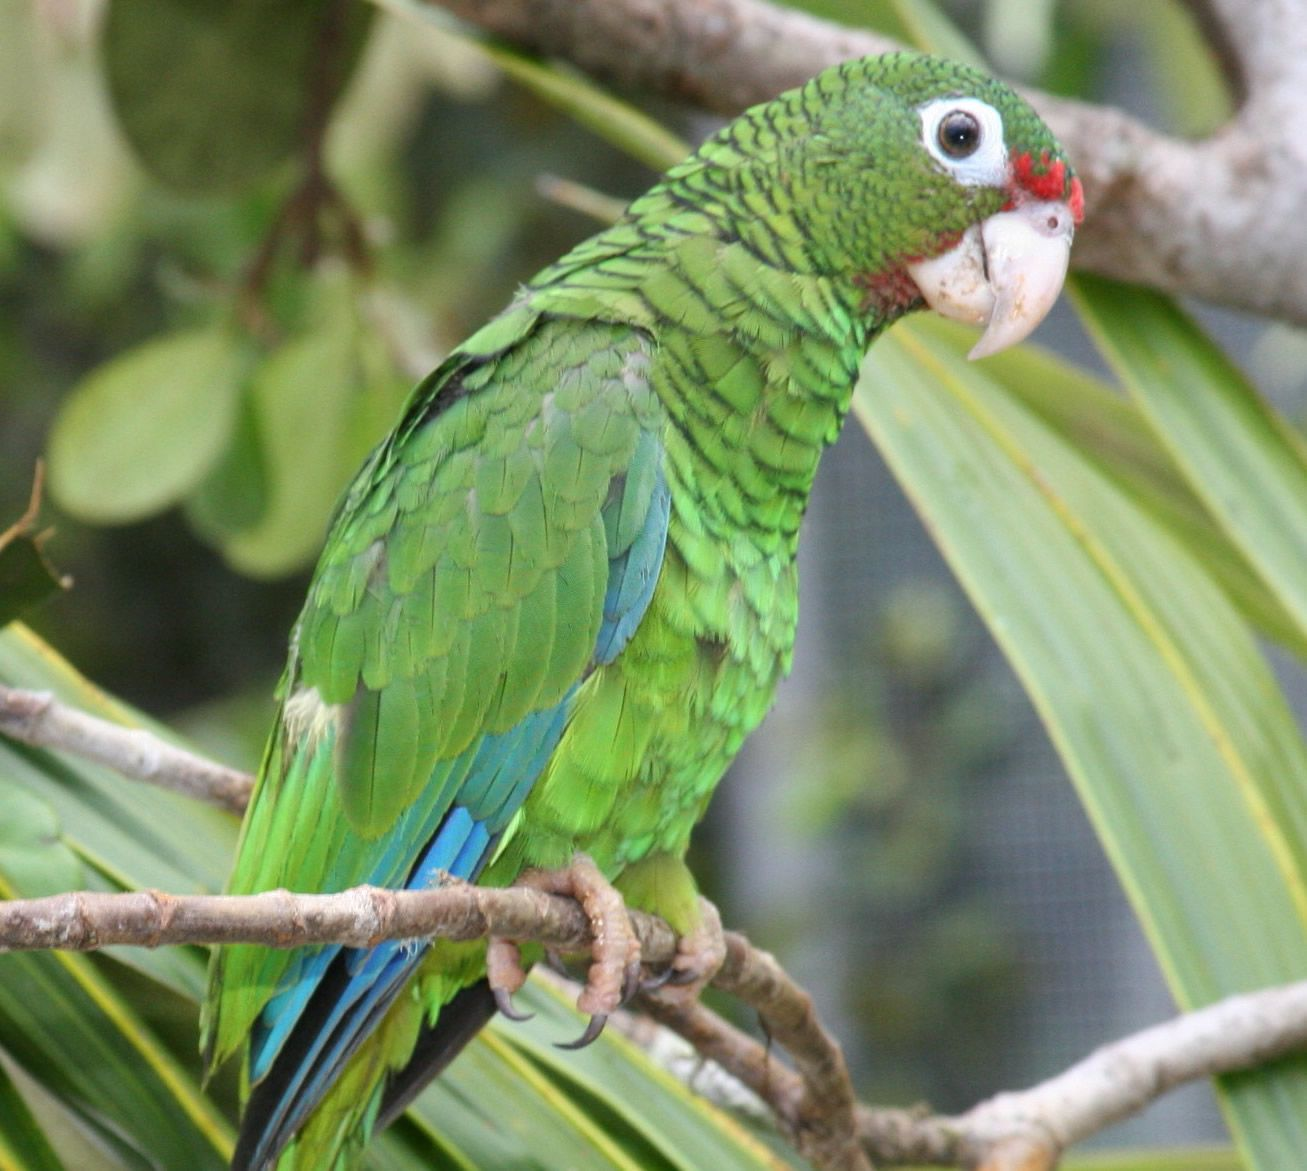 Cotorra clipart clipart library stock Critically Endangered Puerto Rican Amazon parrot (Cotorra ... clipart library stock